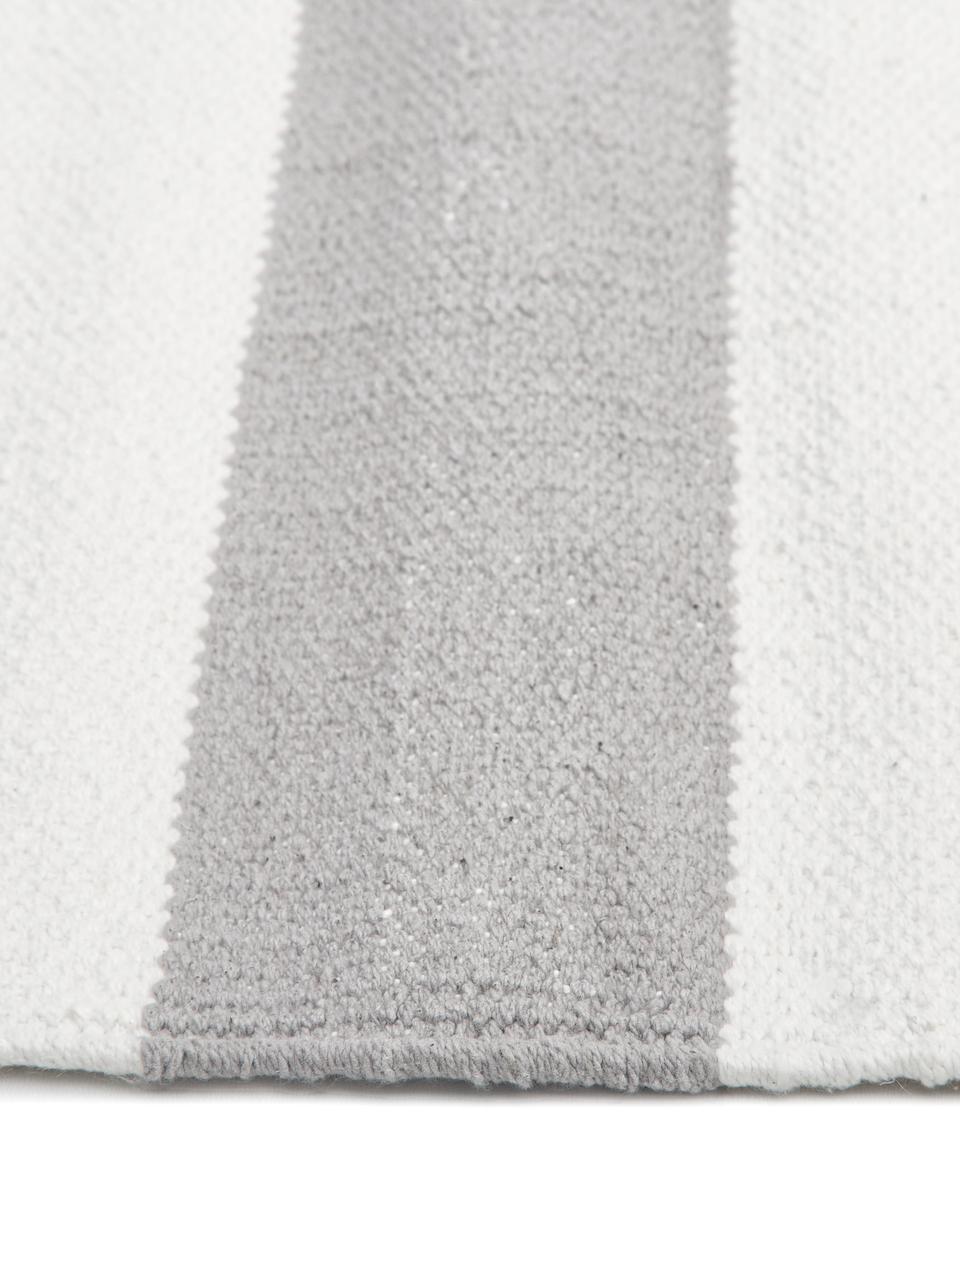 Tapis rayé gris blanc tissé main Blocker, Blanc crème/gris clair